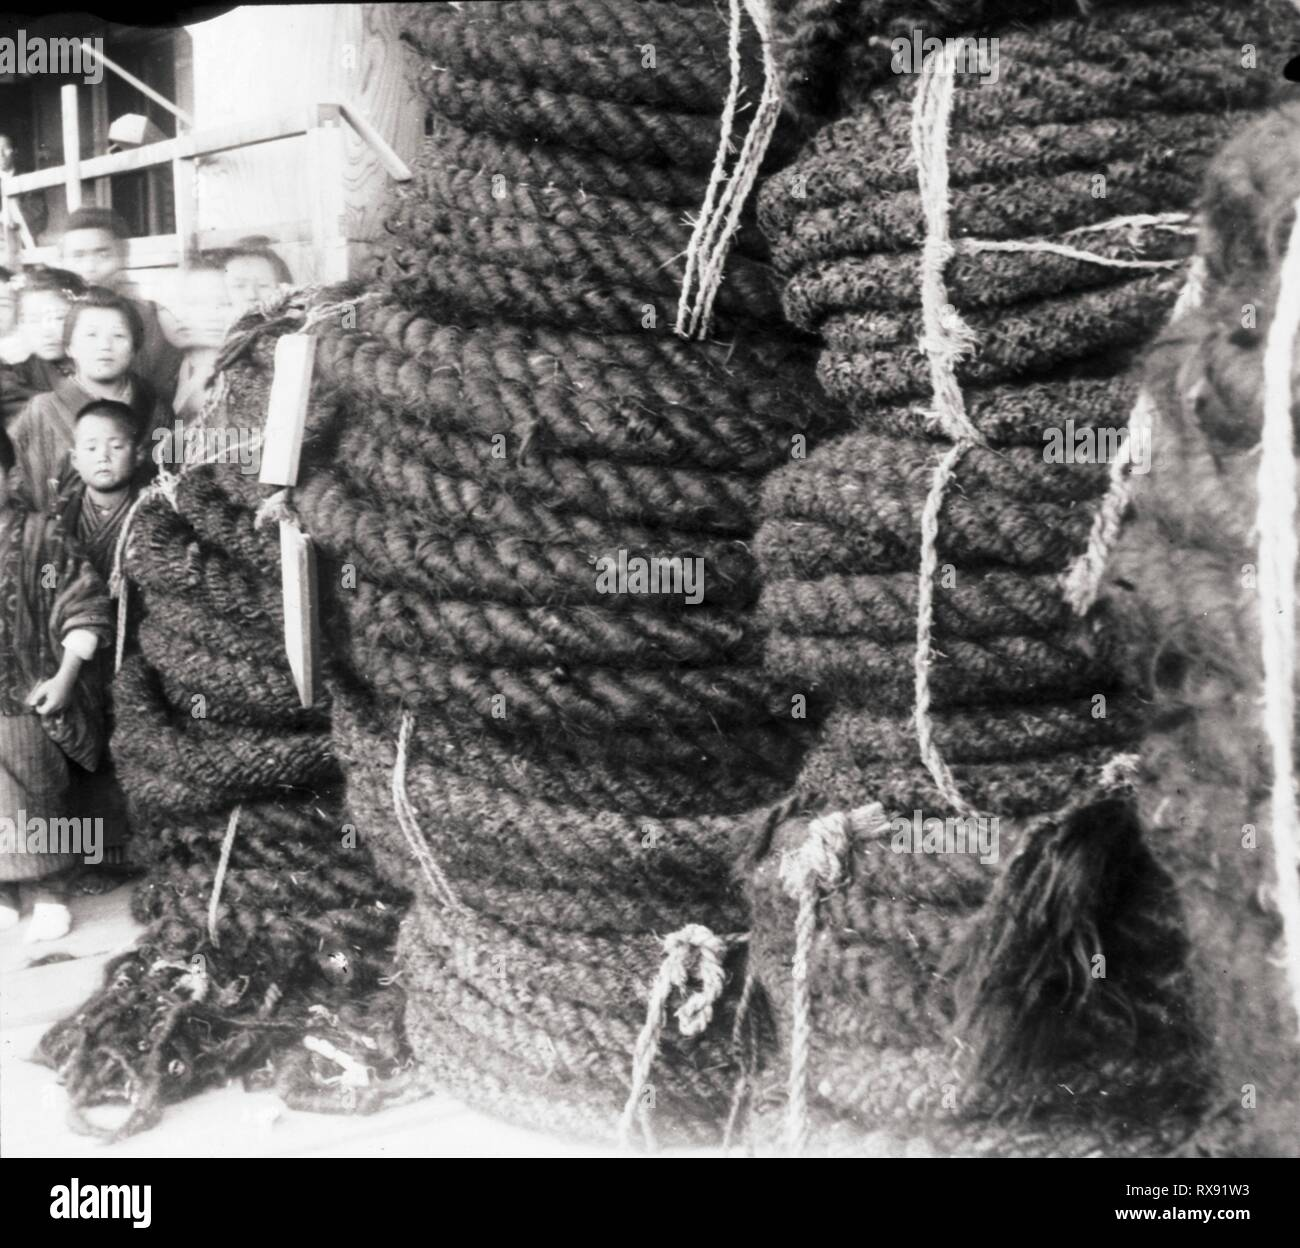 human hair rope